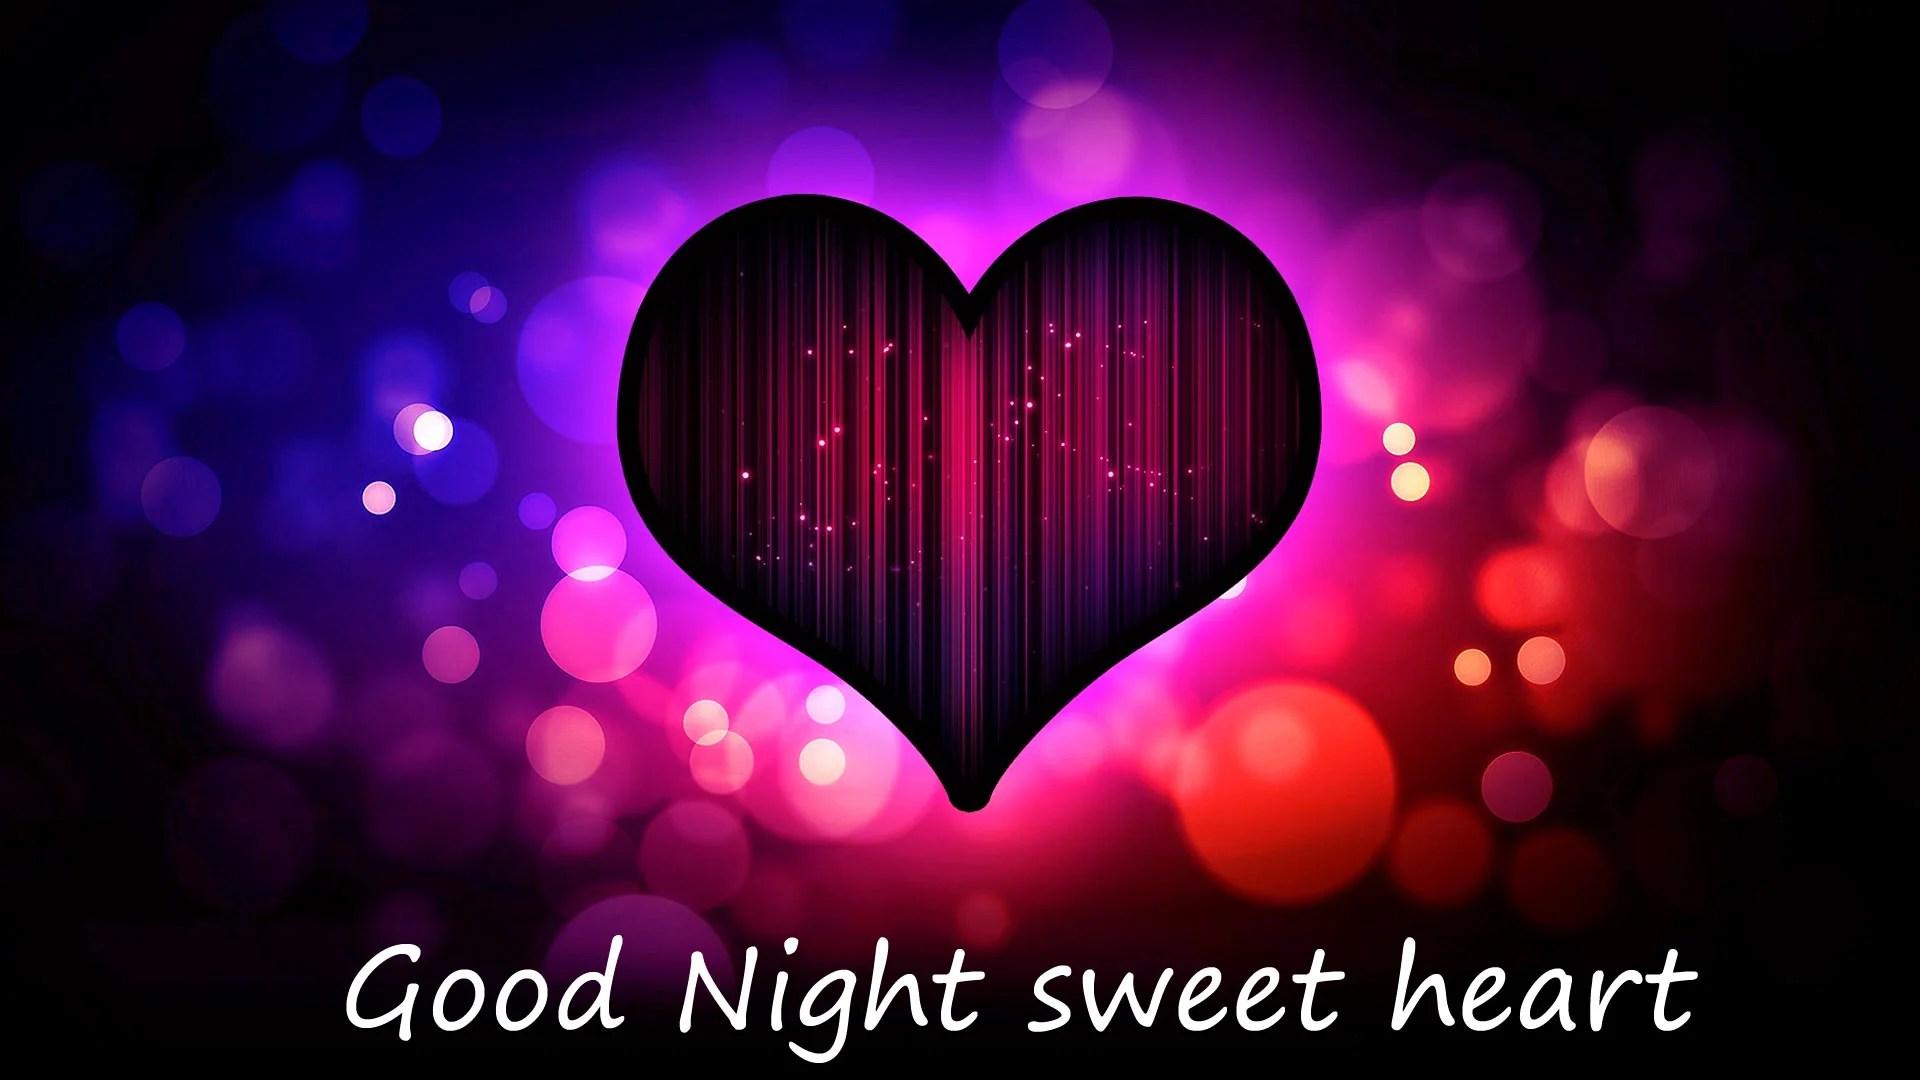 Good Night Heart love image